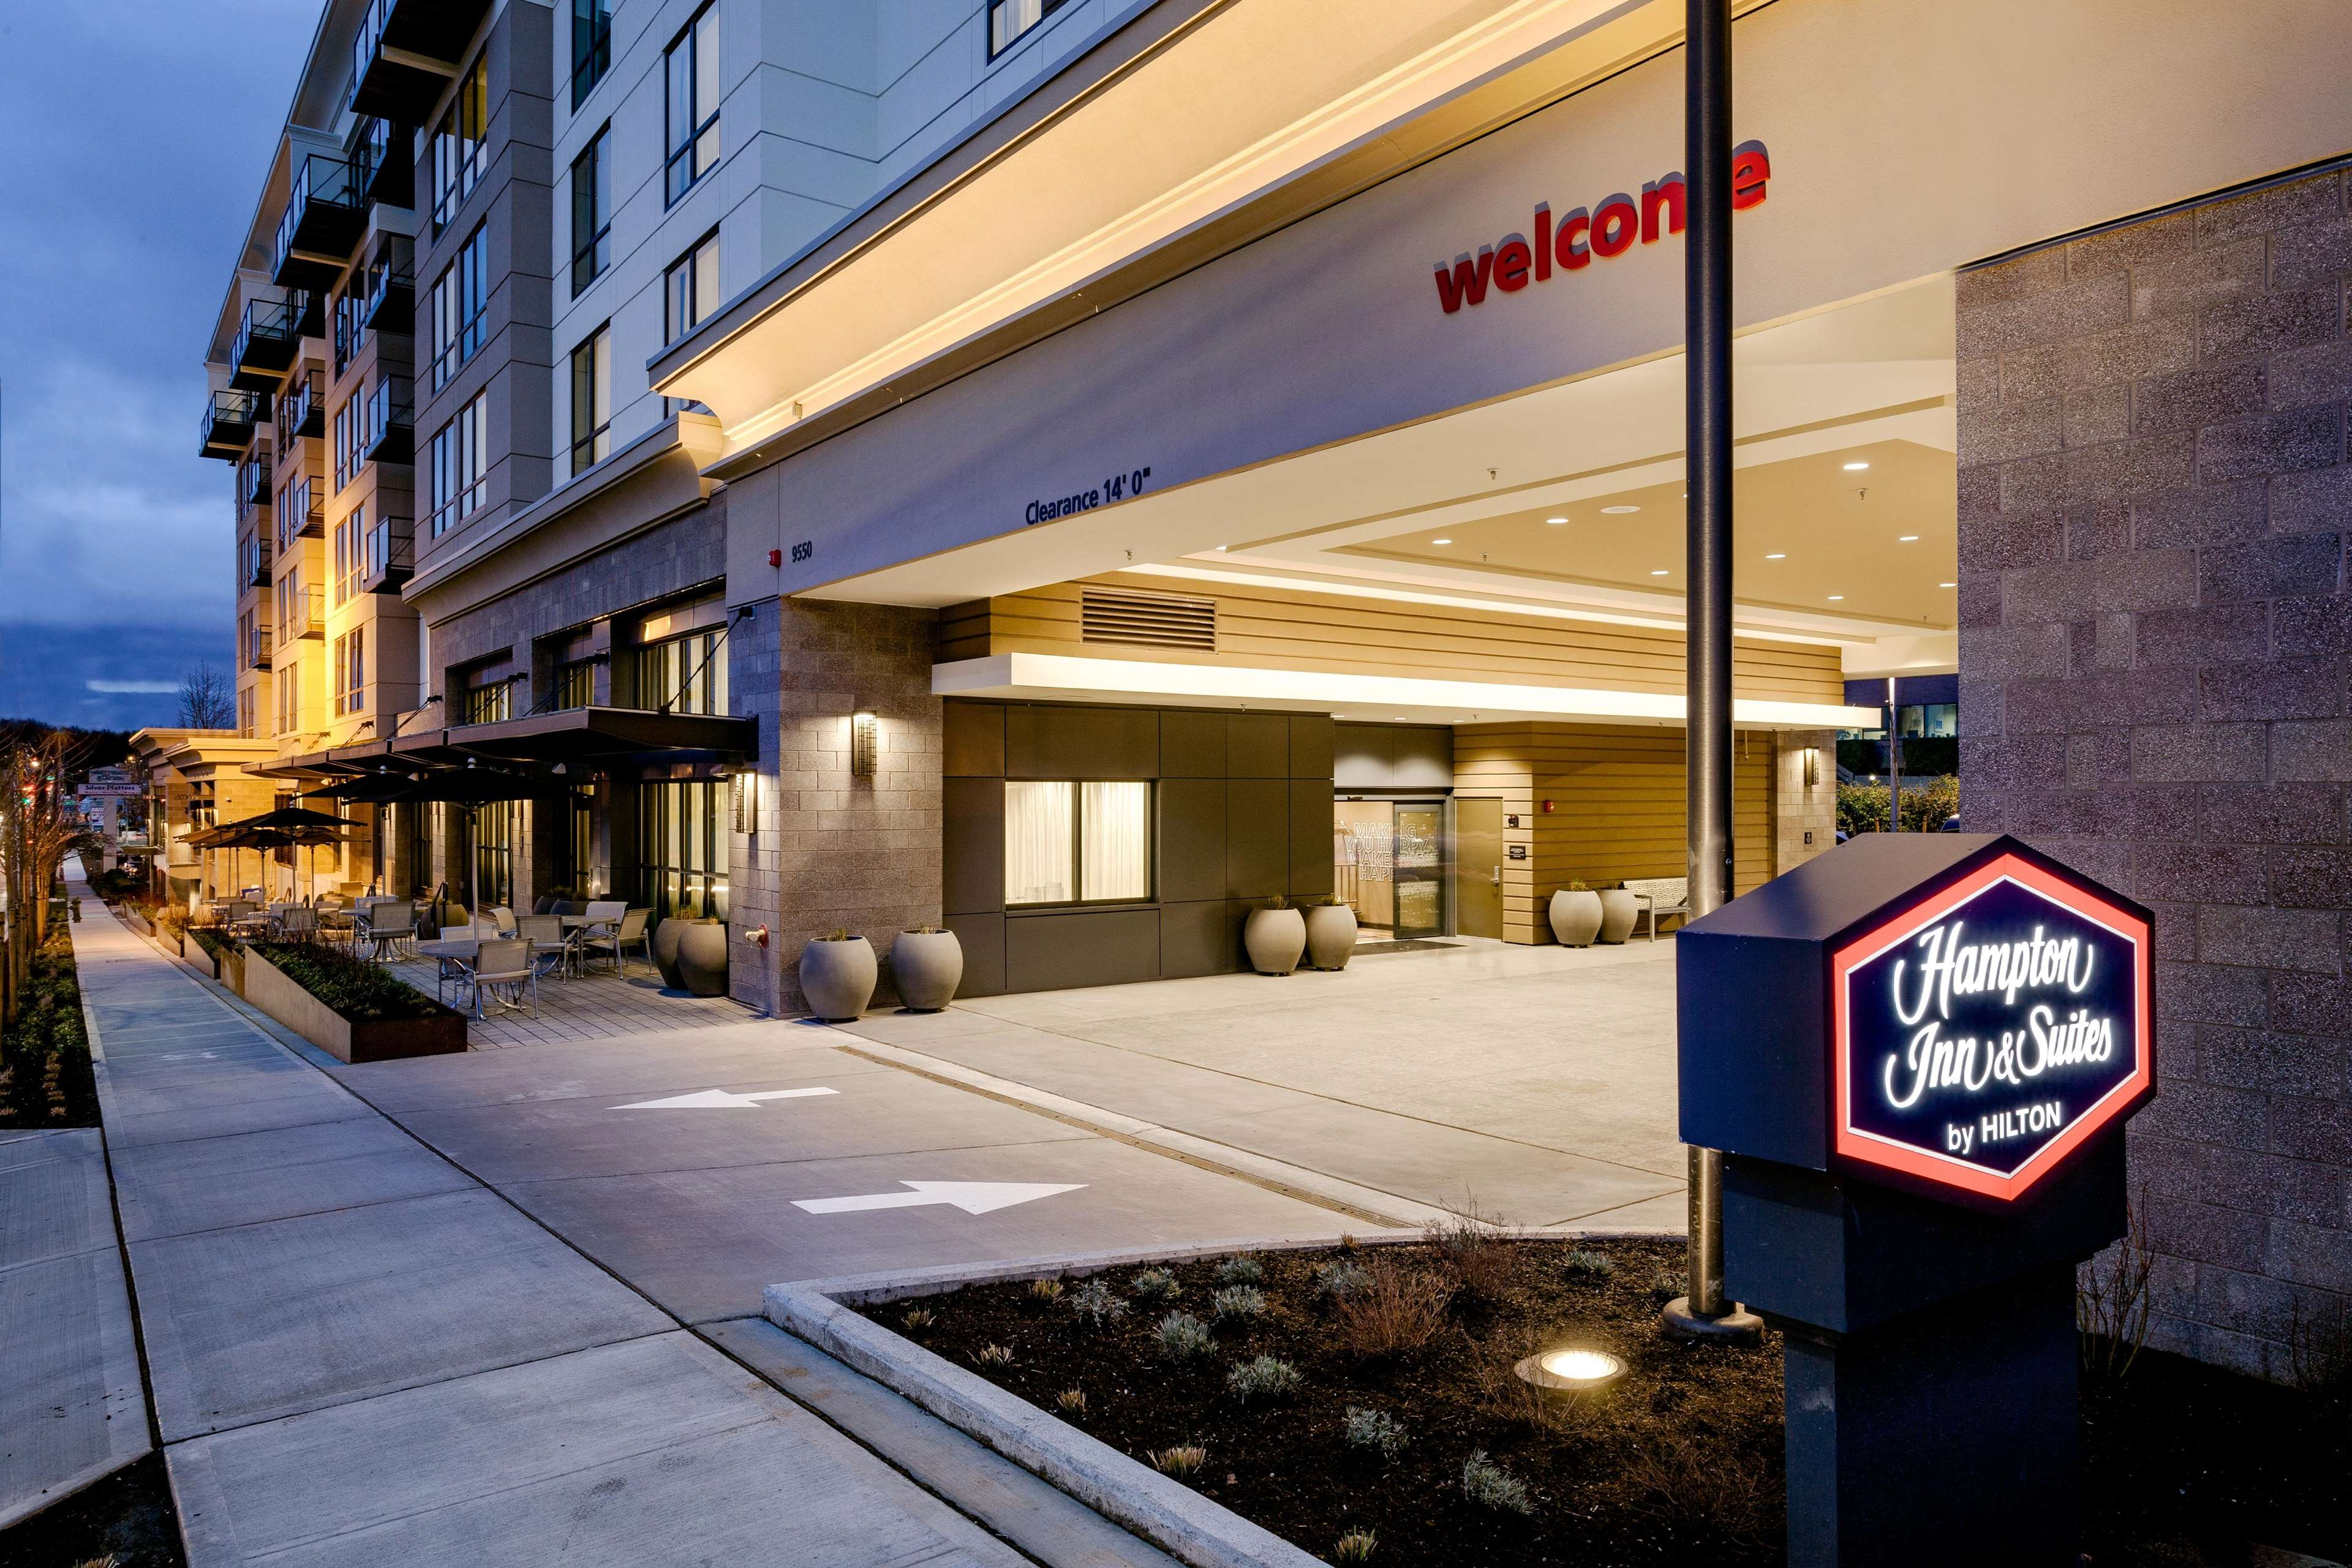 Hampton Inn & Suites by Hilton Seattle/Northgate image 2